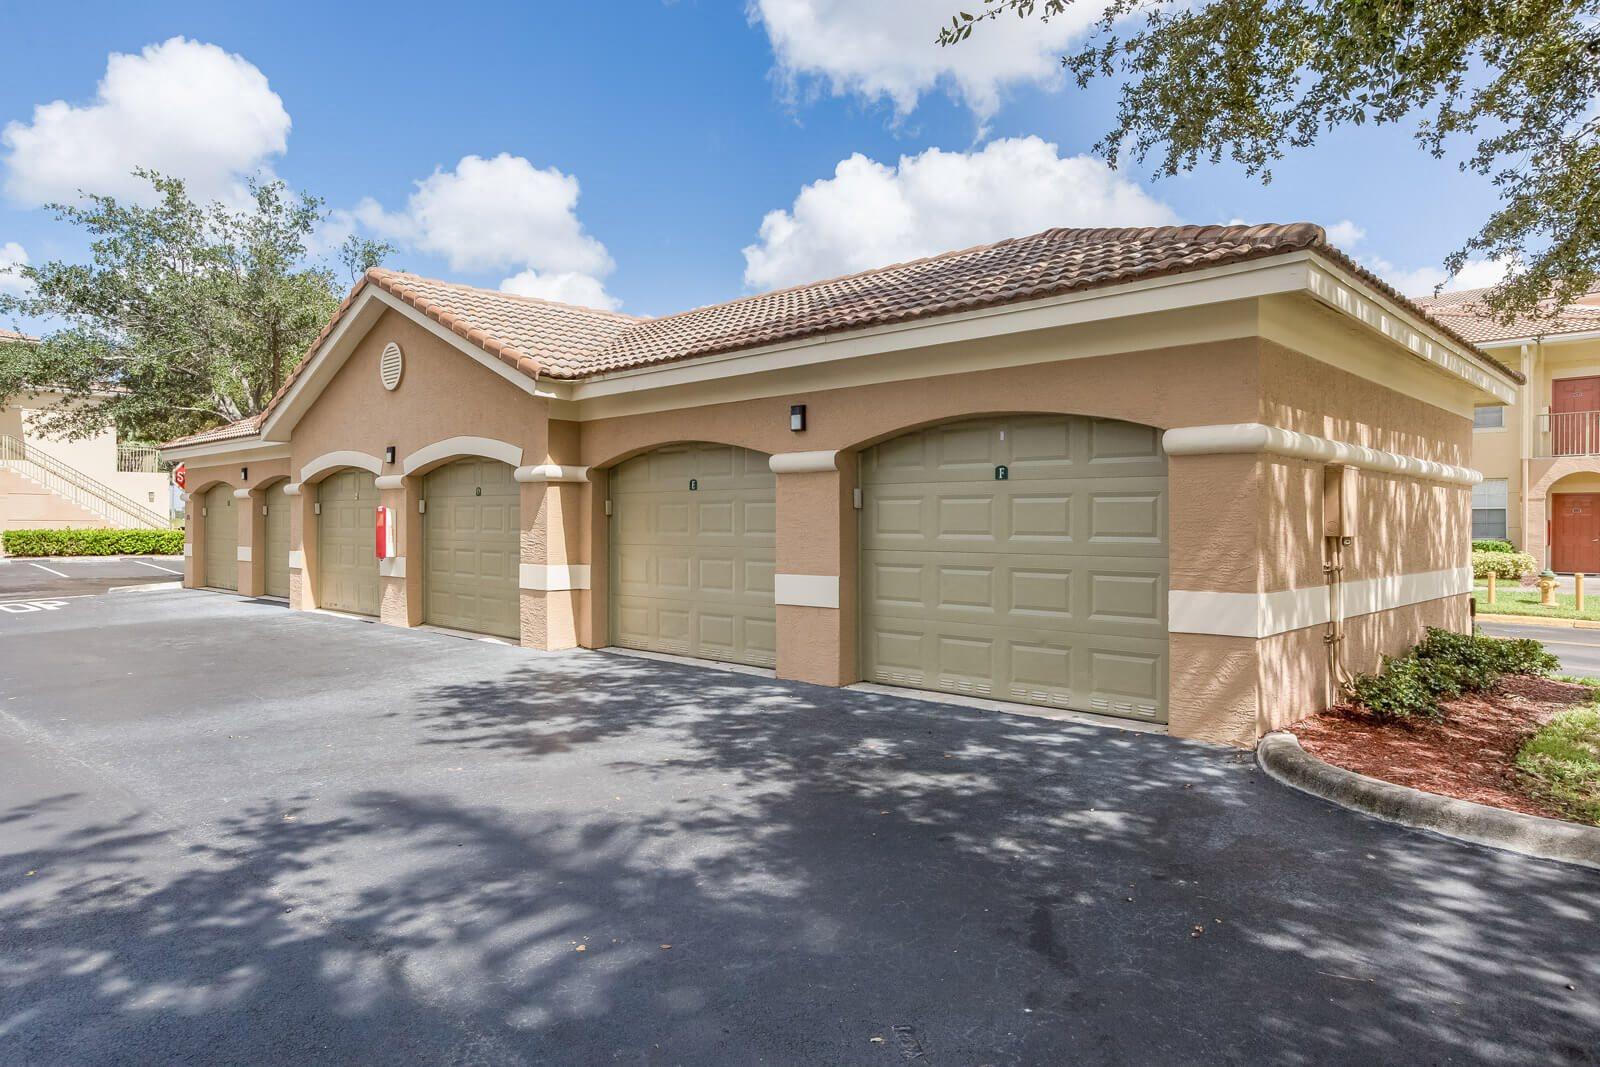 Private Garages Available at Windsor at Miramar, Miramar, Florida